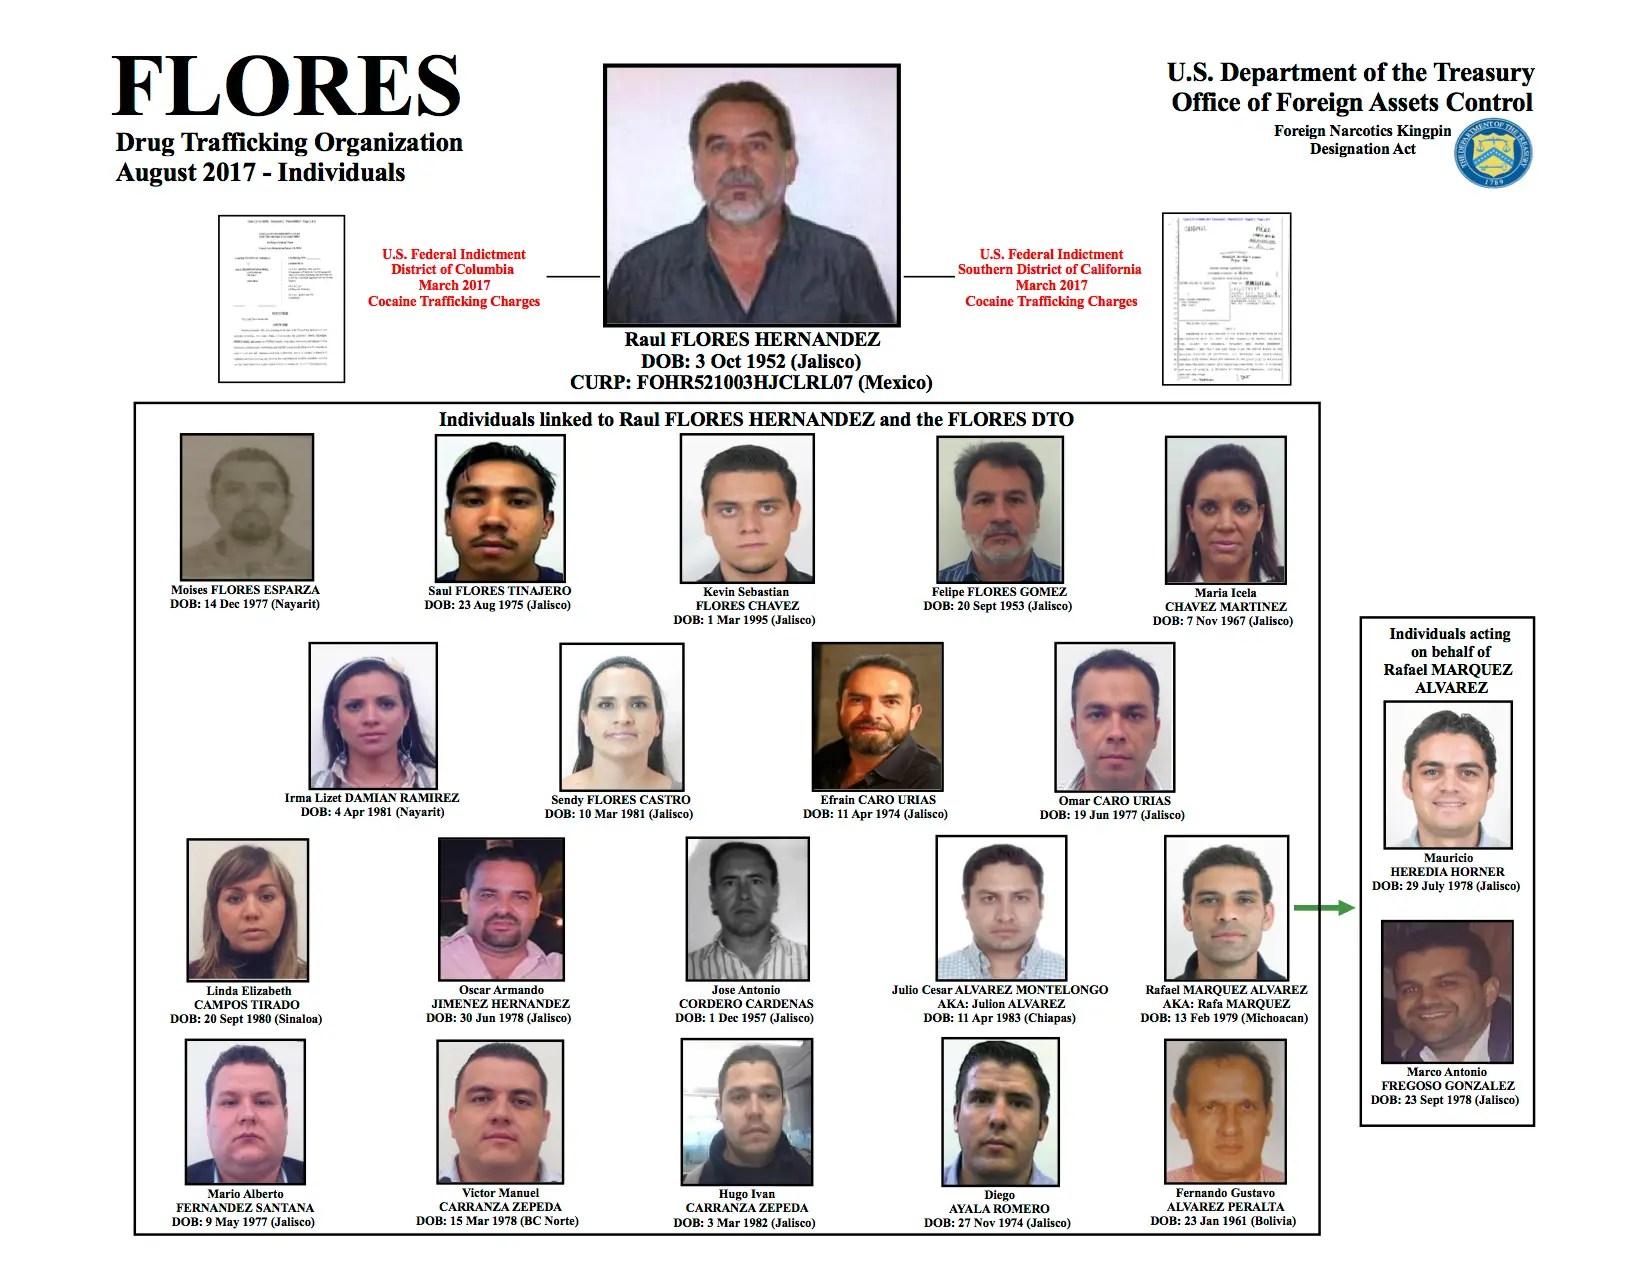 Raul Flores Hernandez organization